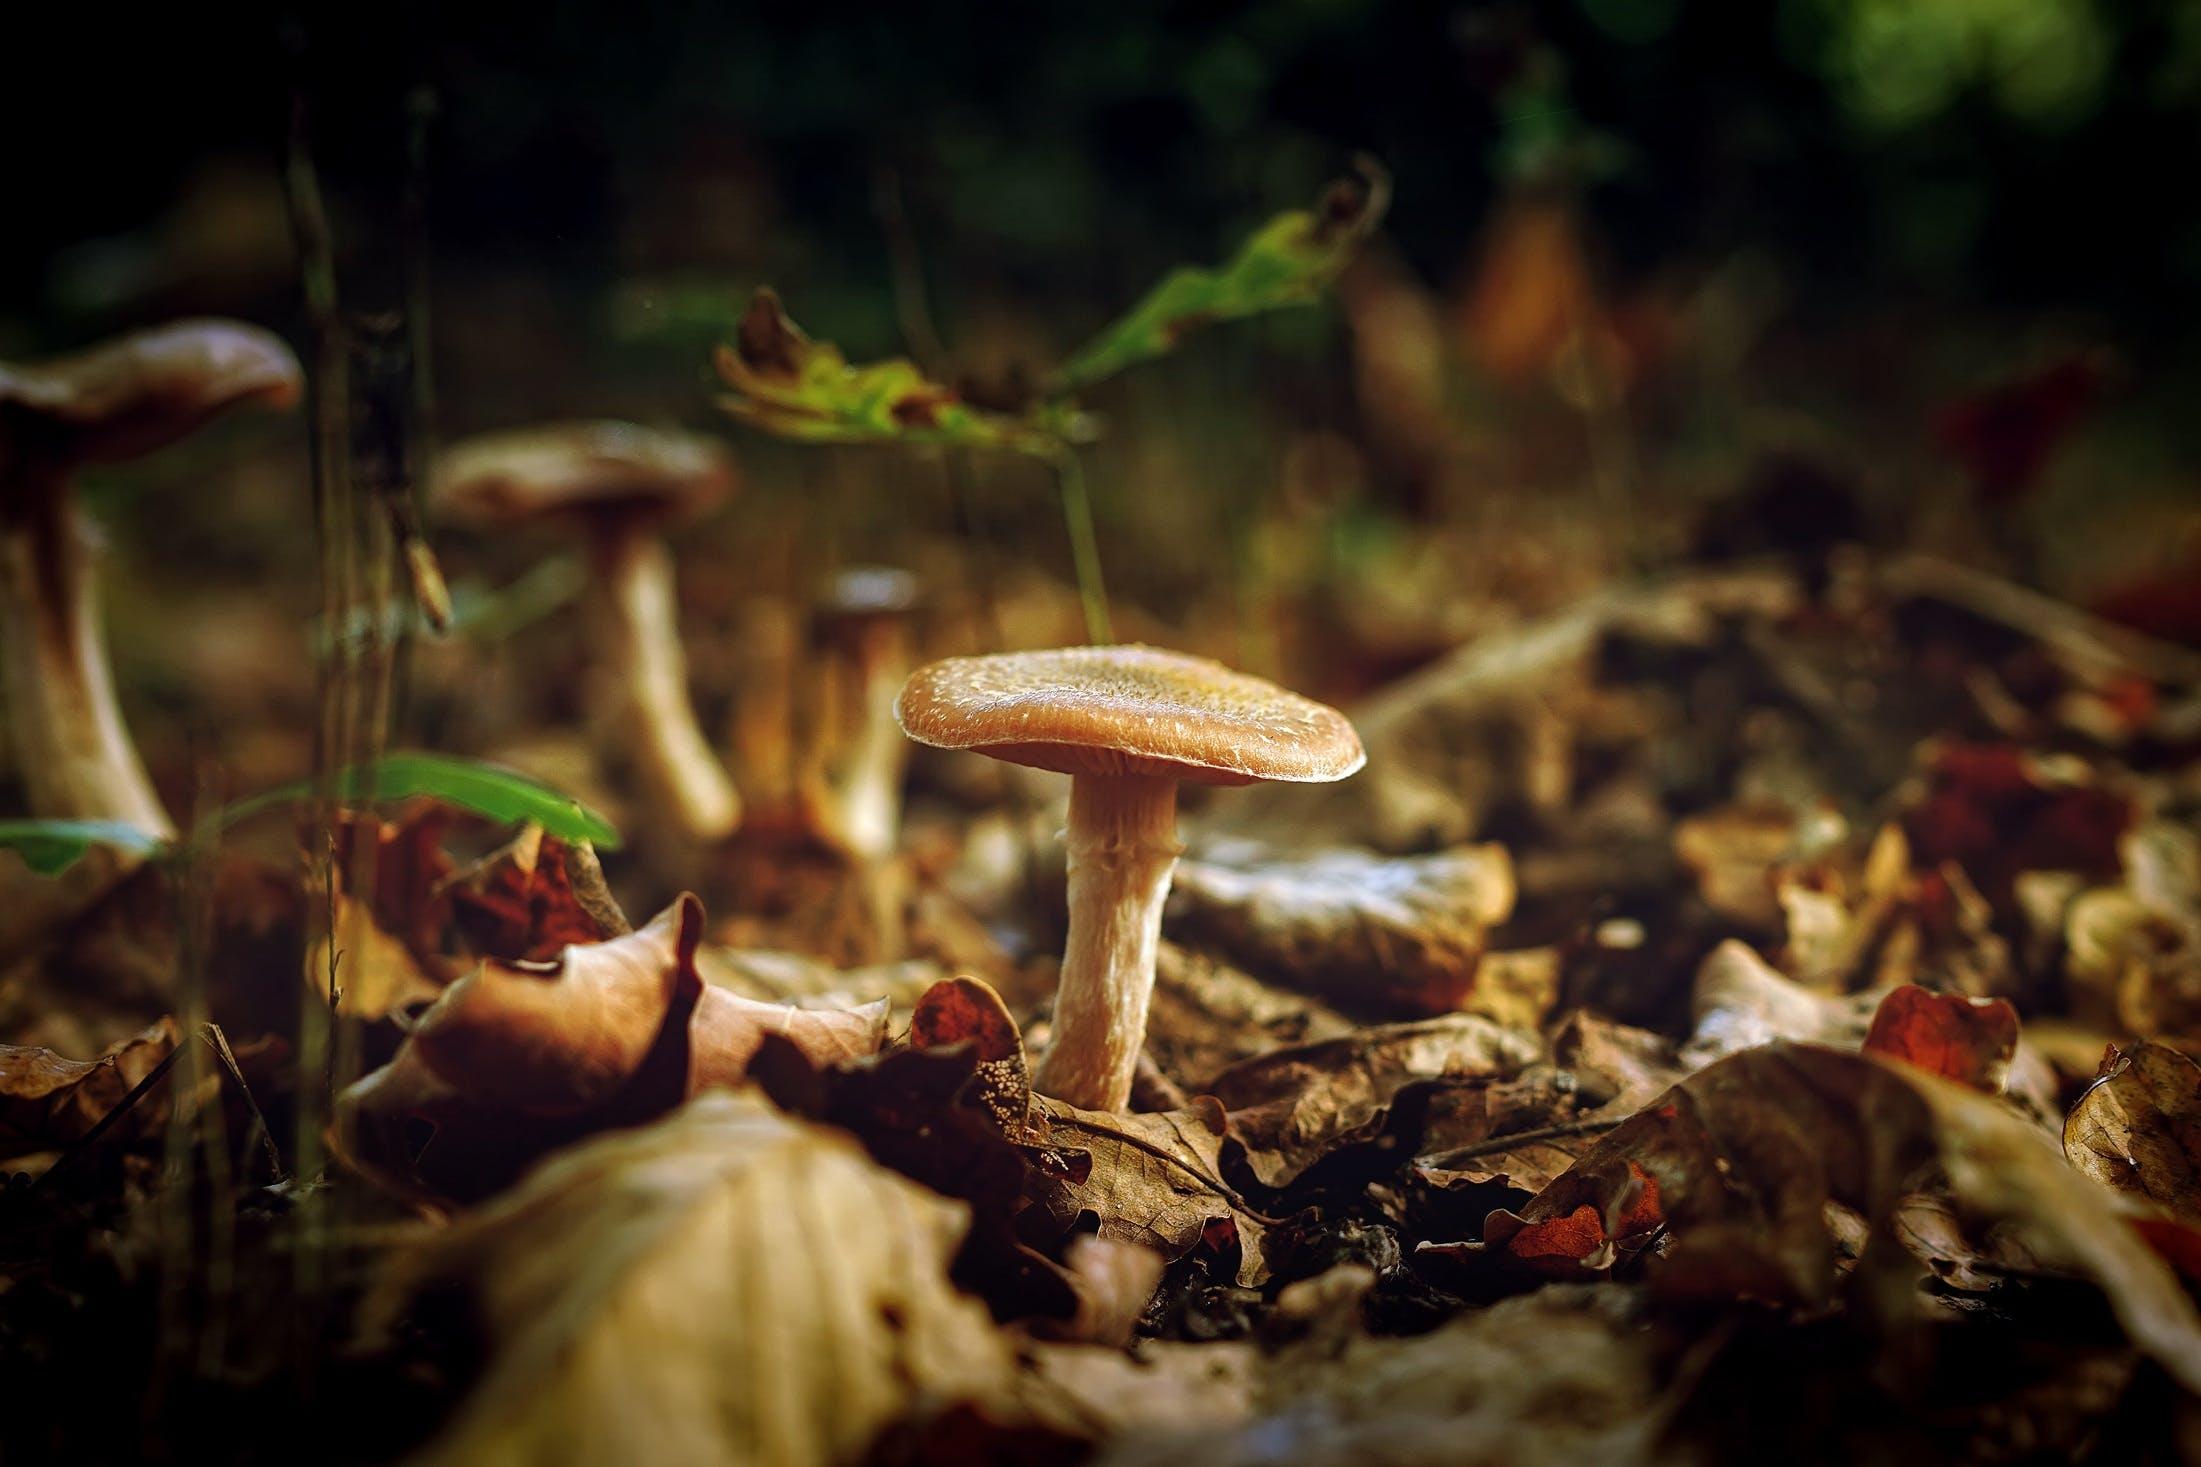 Macro Shot of Mushroom